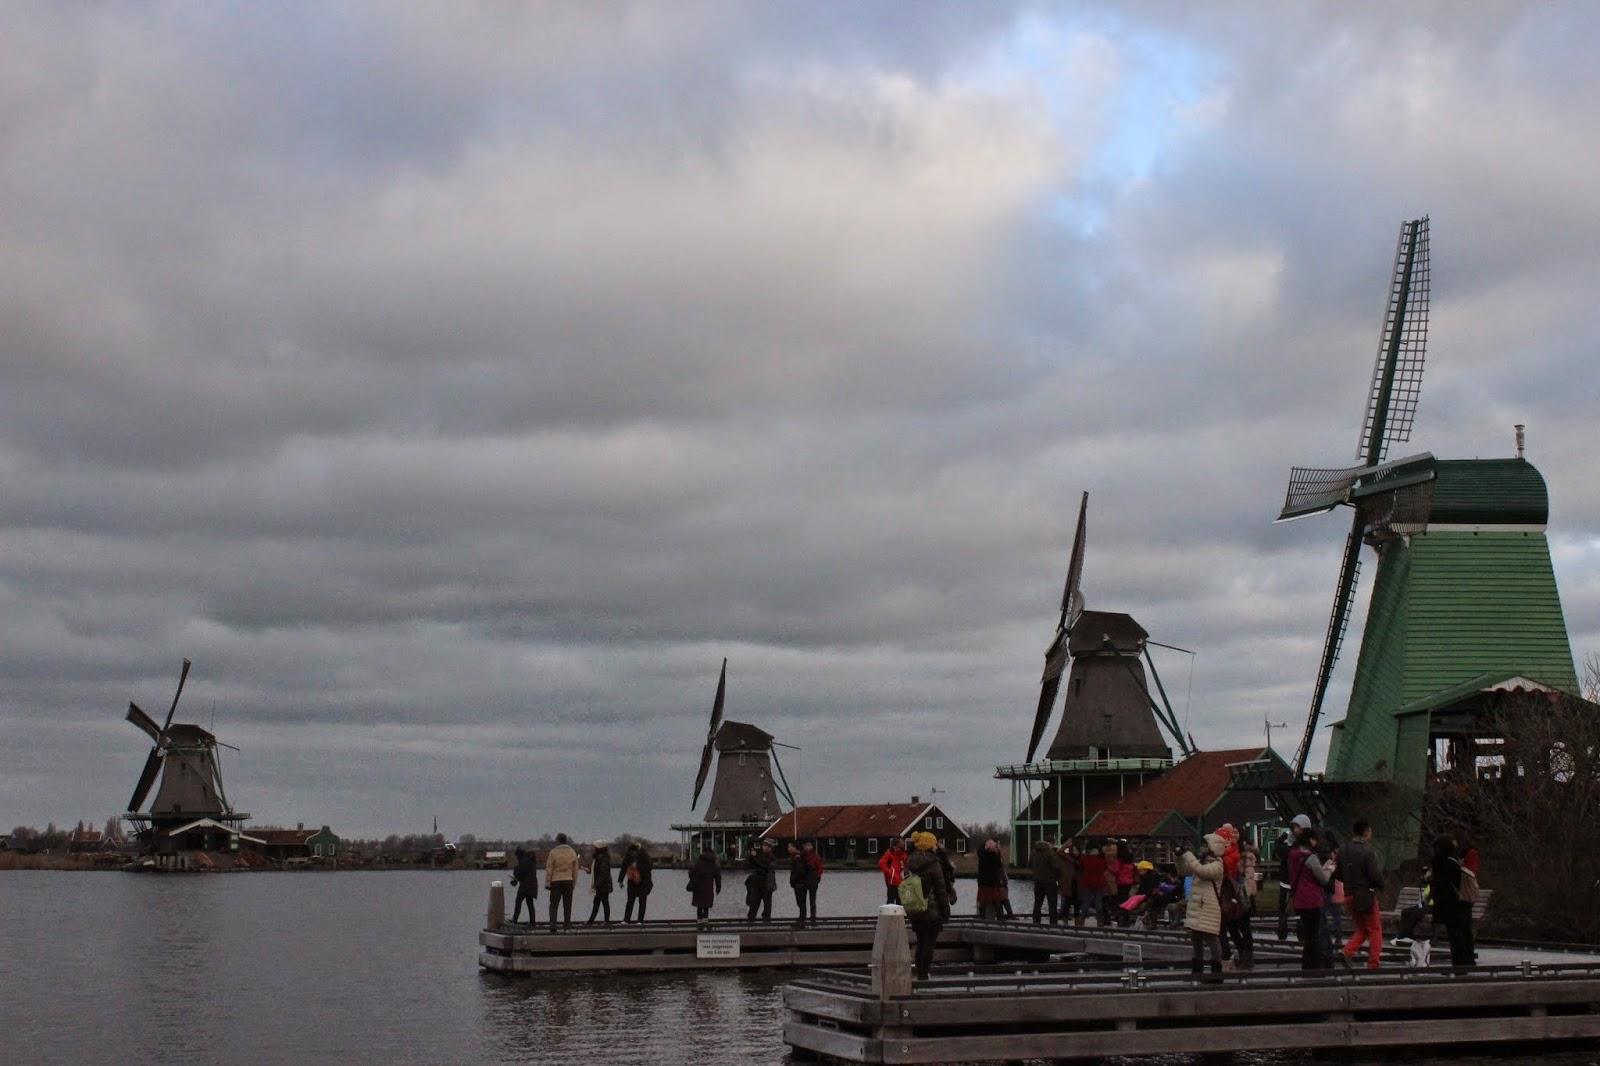 Cuaca Buruk di Kincir Angin Zaanse Schans, Belanda